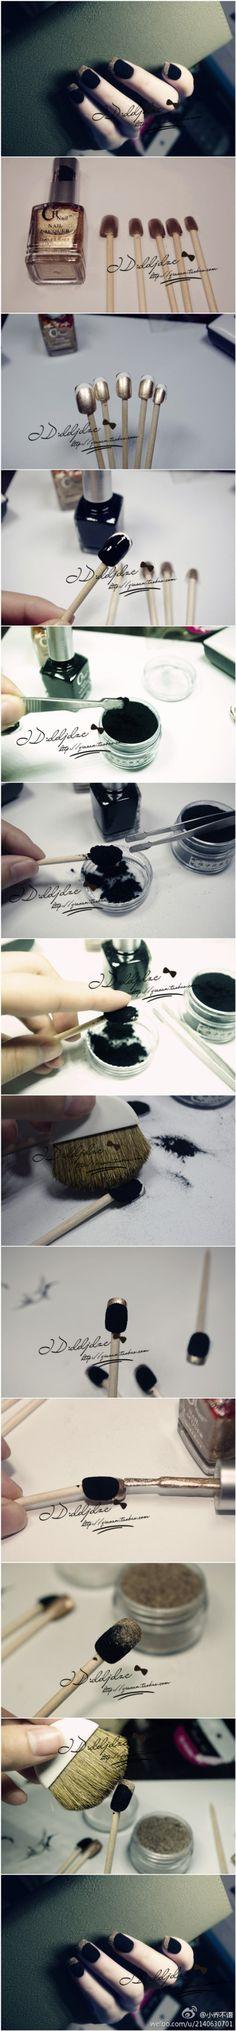 Velvet nails with flocking powder. Love it!